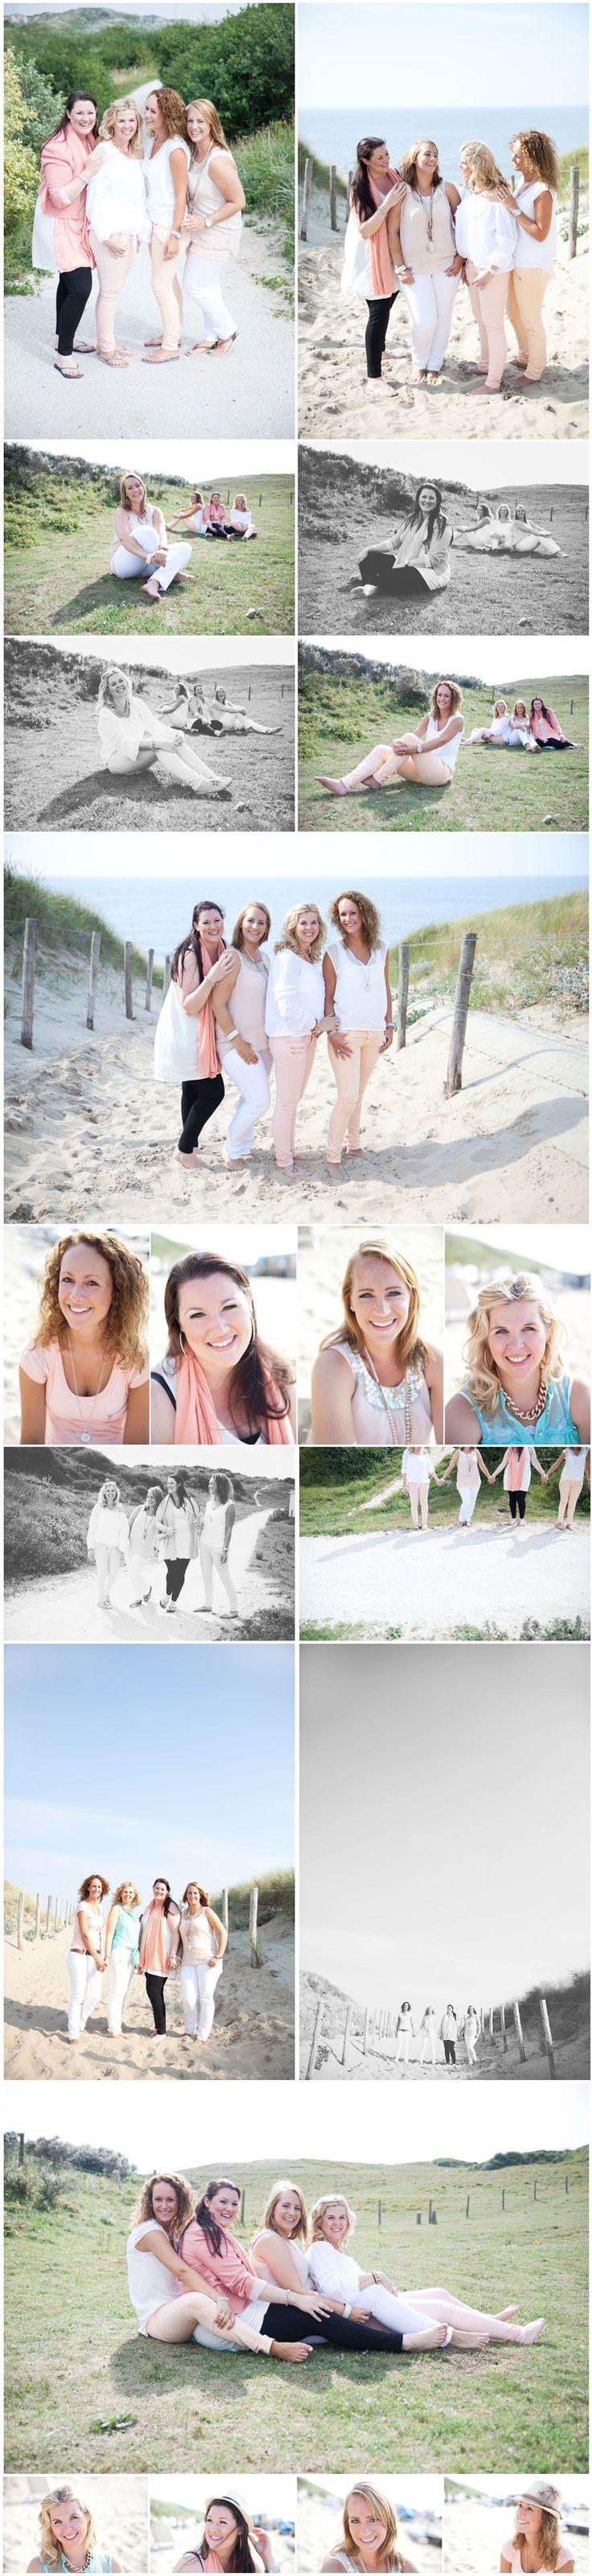 Vriendinnen – M&M&R&R » Eline Visscher Fotografie | Pure en liefdevolle foto's